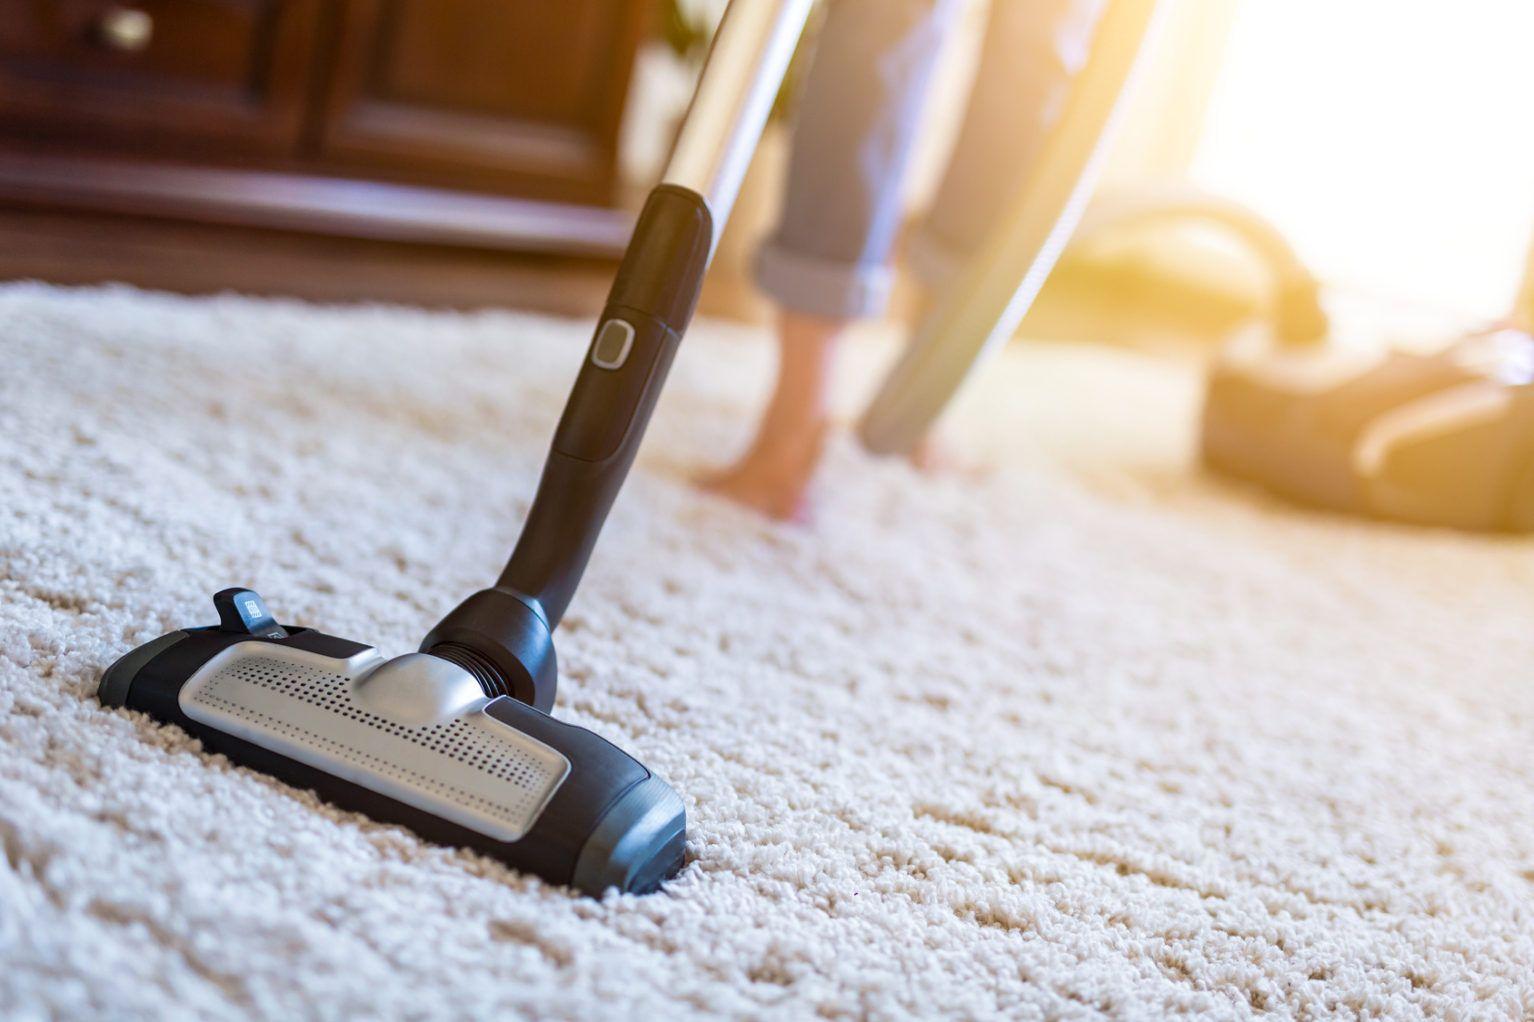 Clean carpetshealthy families how to clean carpet